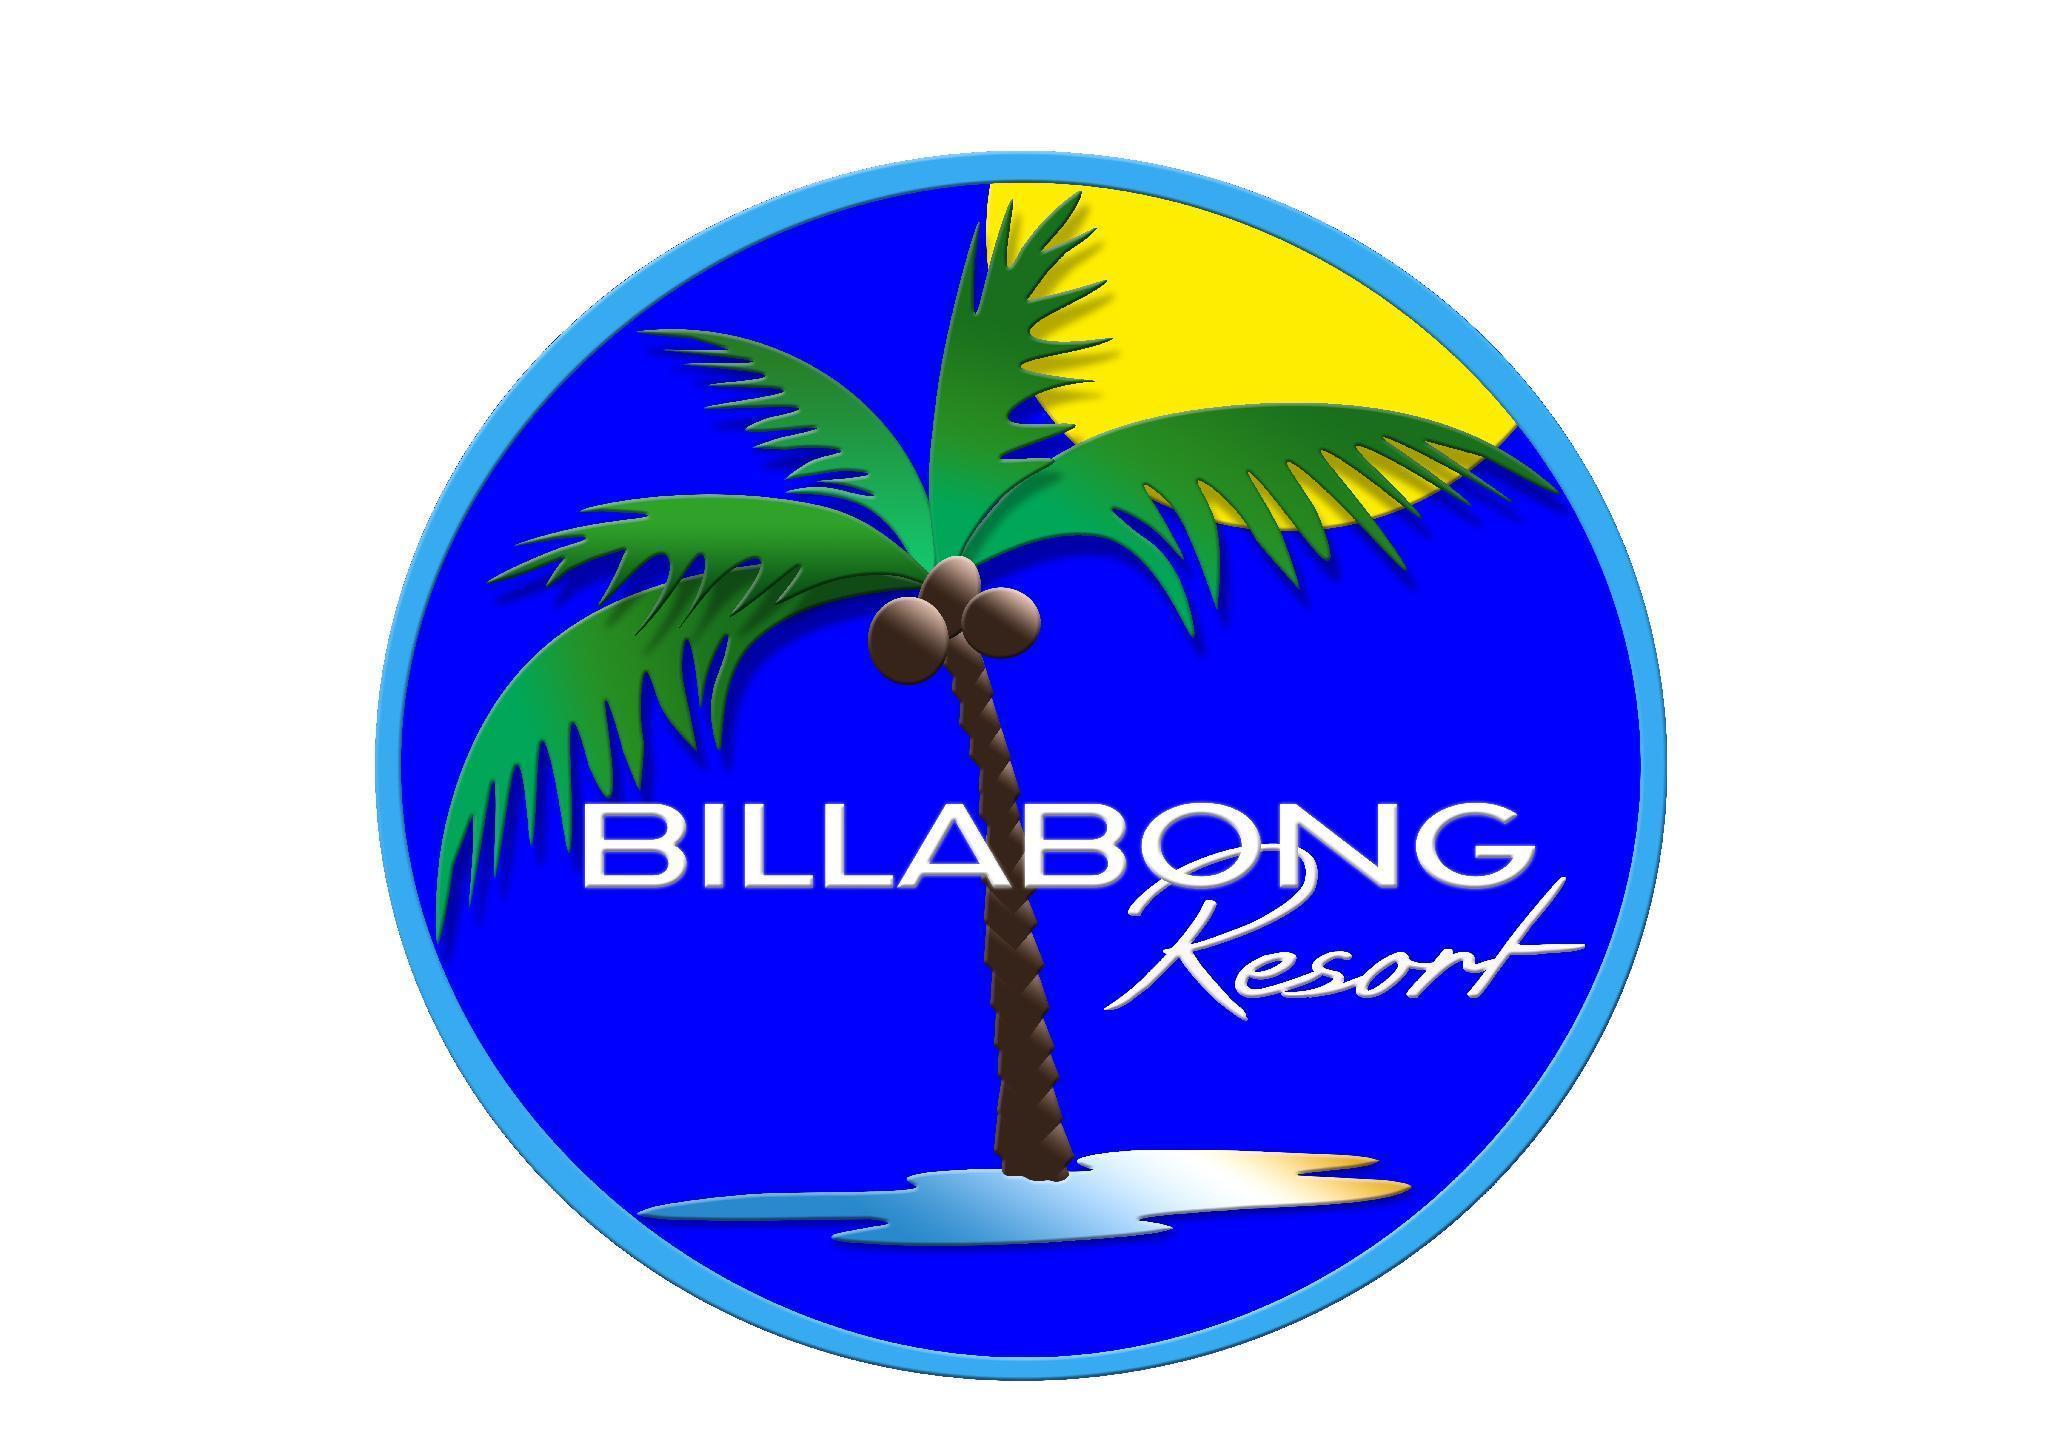 Billabong-Resort อพาร์ตเมนต์ 1 ห้องนอน 1 ห้องน้ำส่วนตัว ขนาด 25 ตร.ม. – ท้องนายปานใหญ่